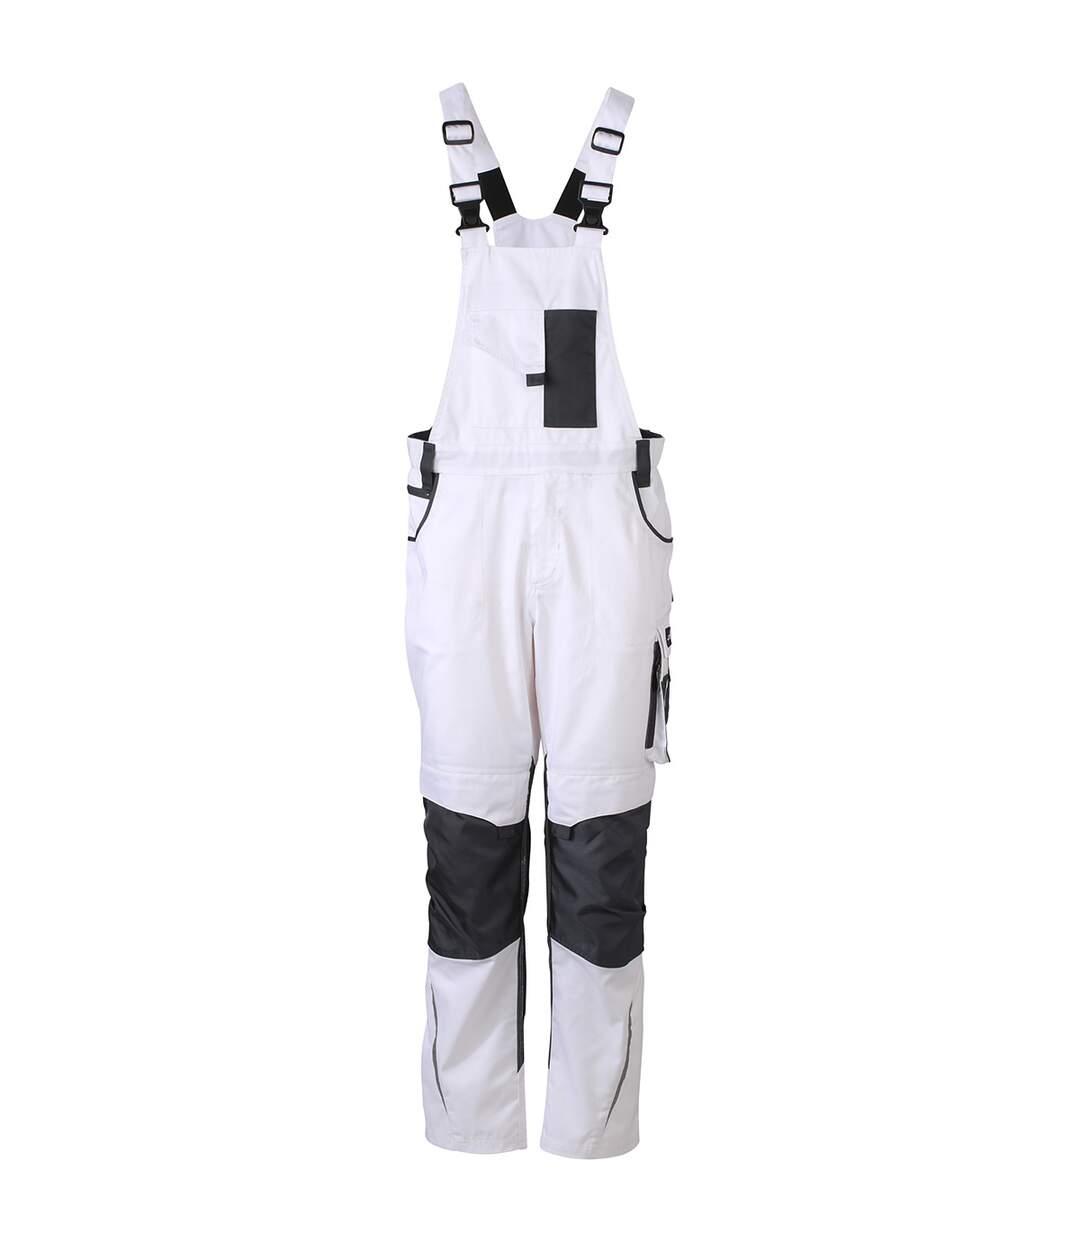 Pantalon de travail homme à bretelles - JN833 - blanc - salopette artisan